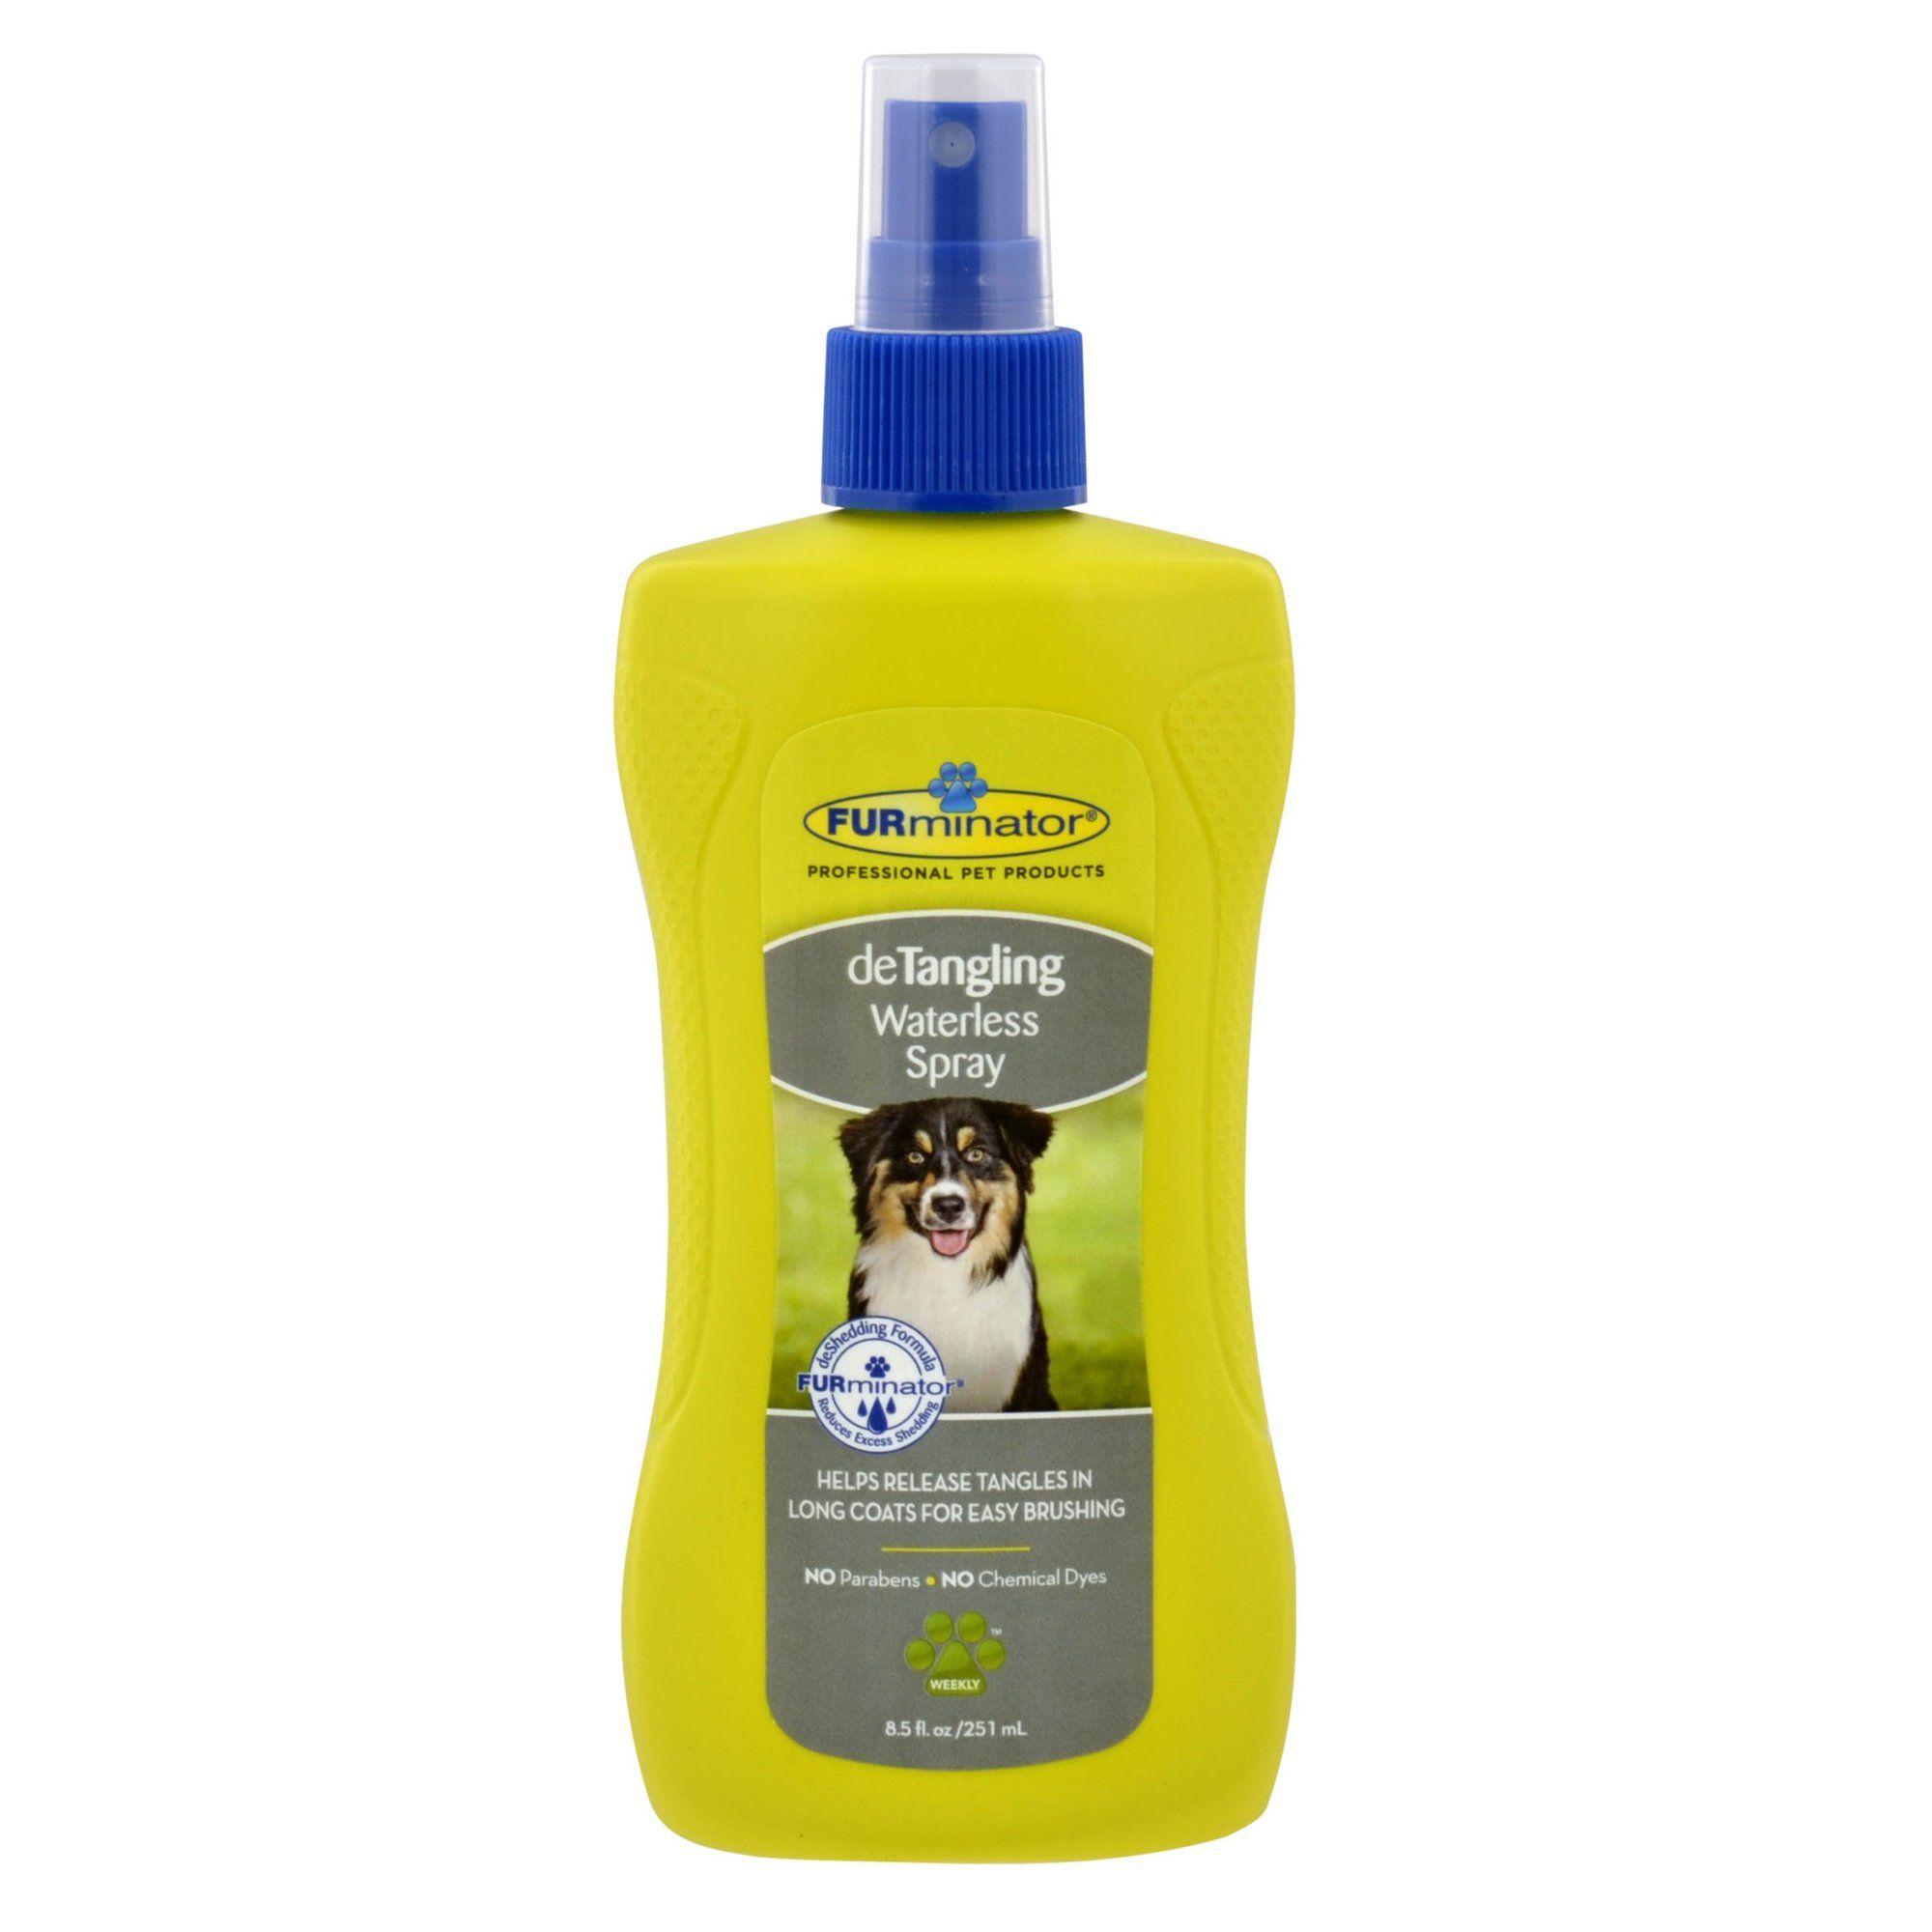 FURminator deTangling Waterless Dog Spray, 8.5 fl. oz, 8.5